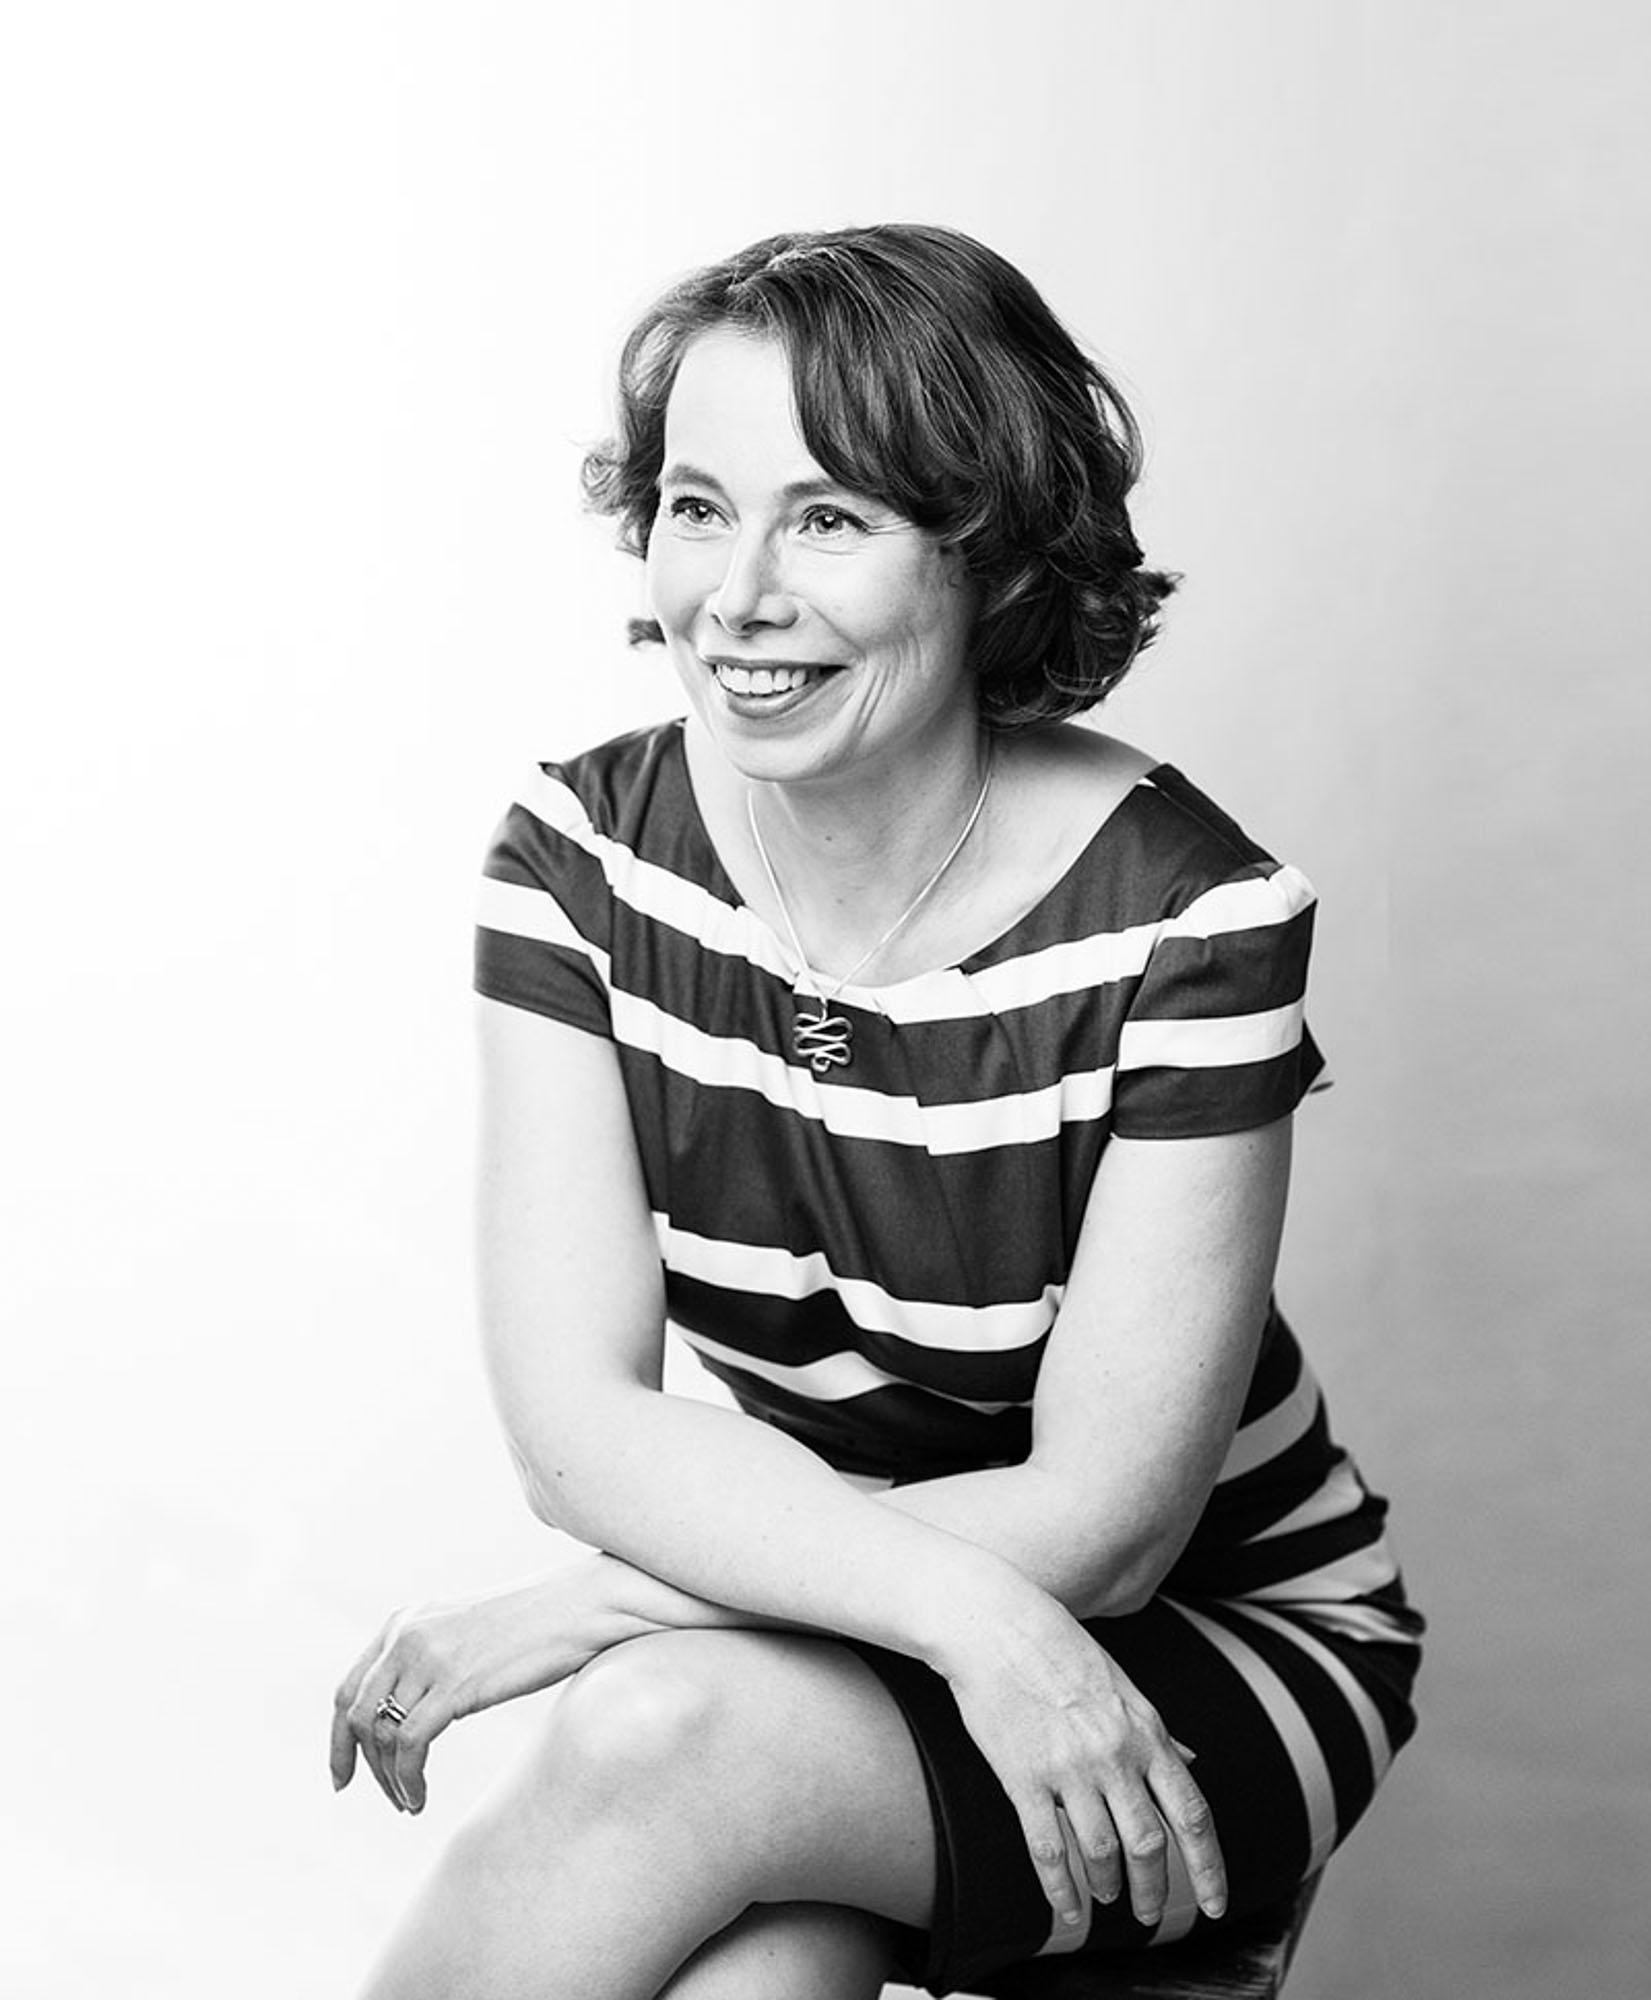 Nainen poseeraa studiossa. A woman posing in astudio shot.